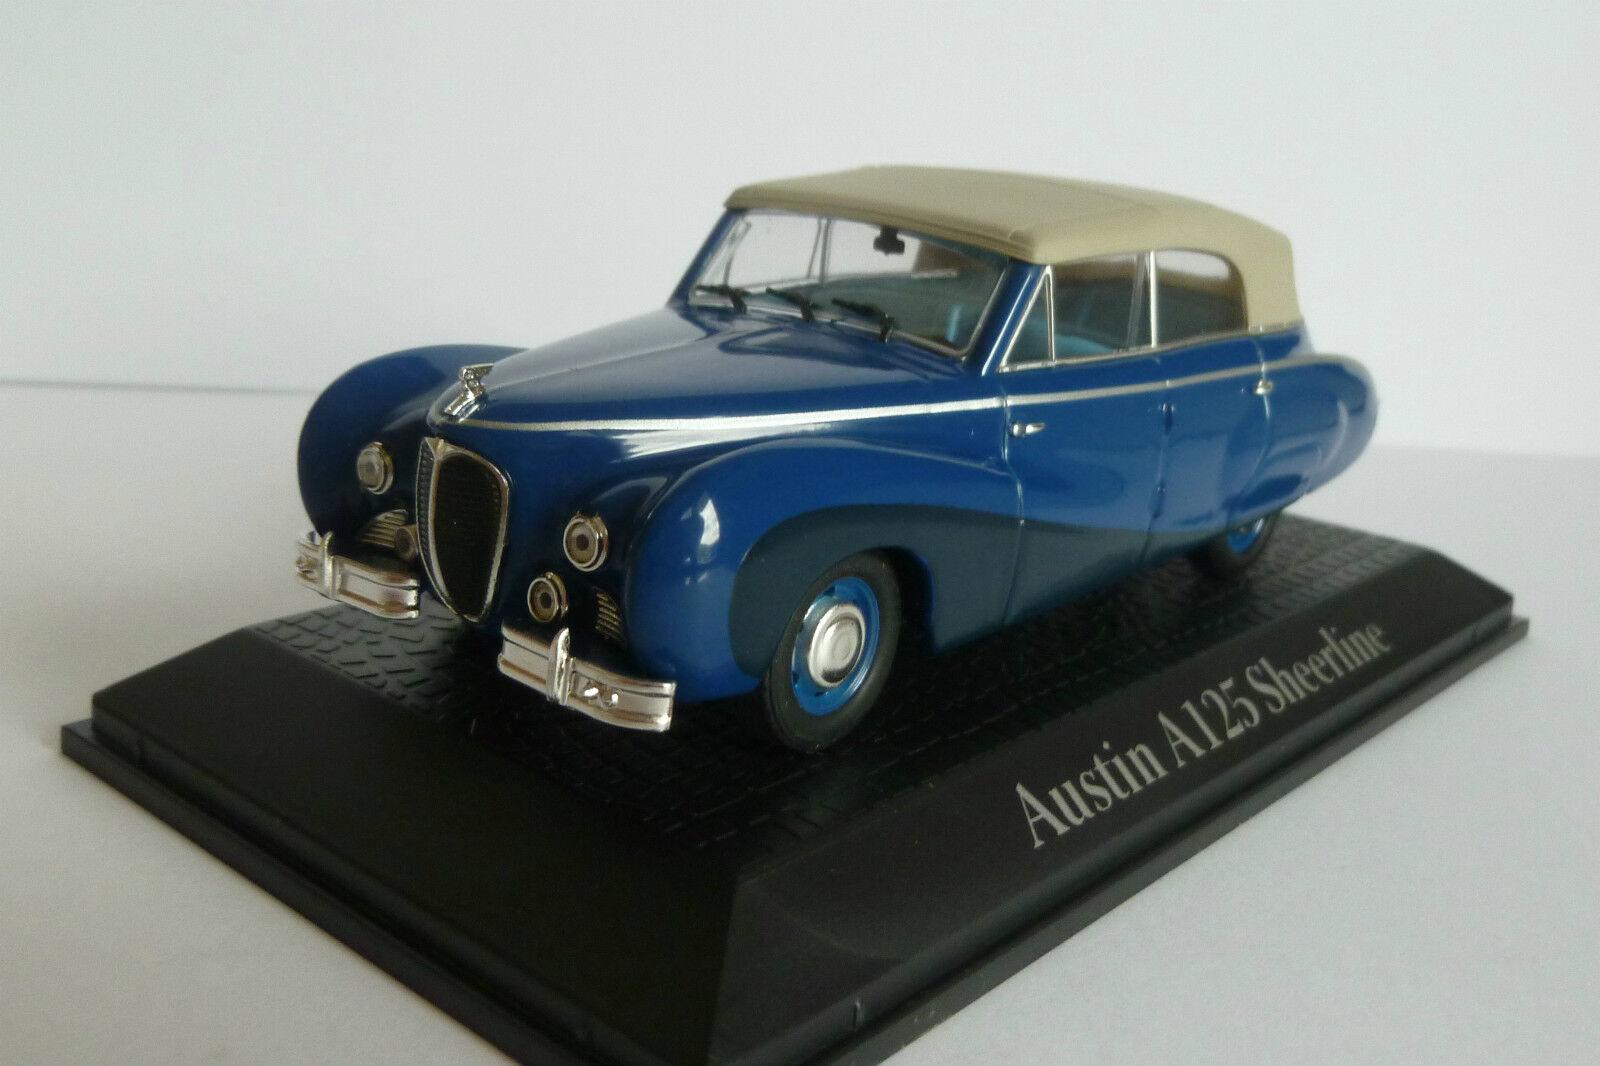 Austin A125 Sheerline, 1 43 IXO Atlas Editions presidential limousine